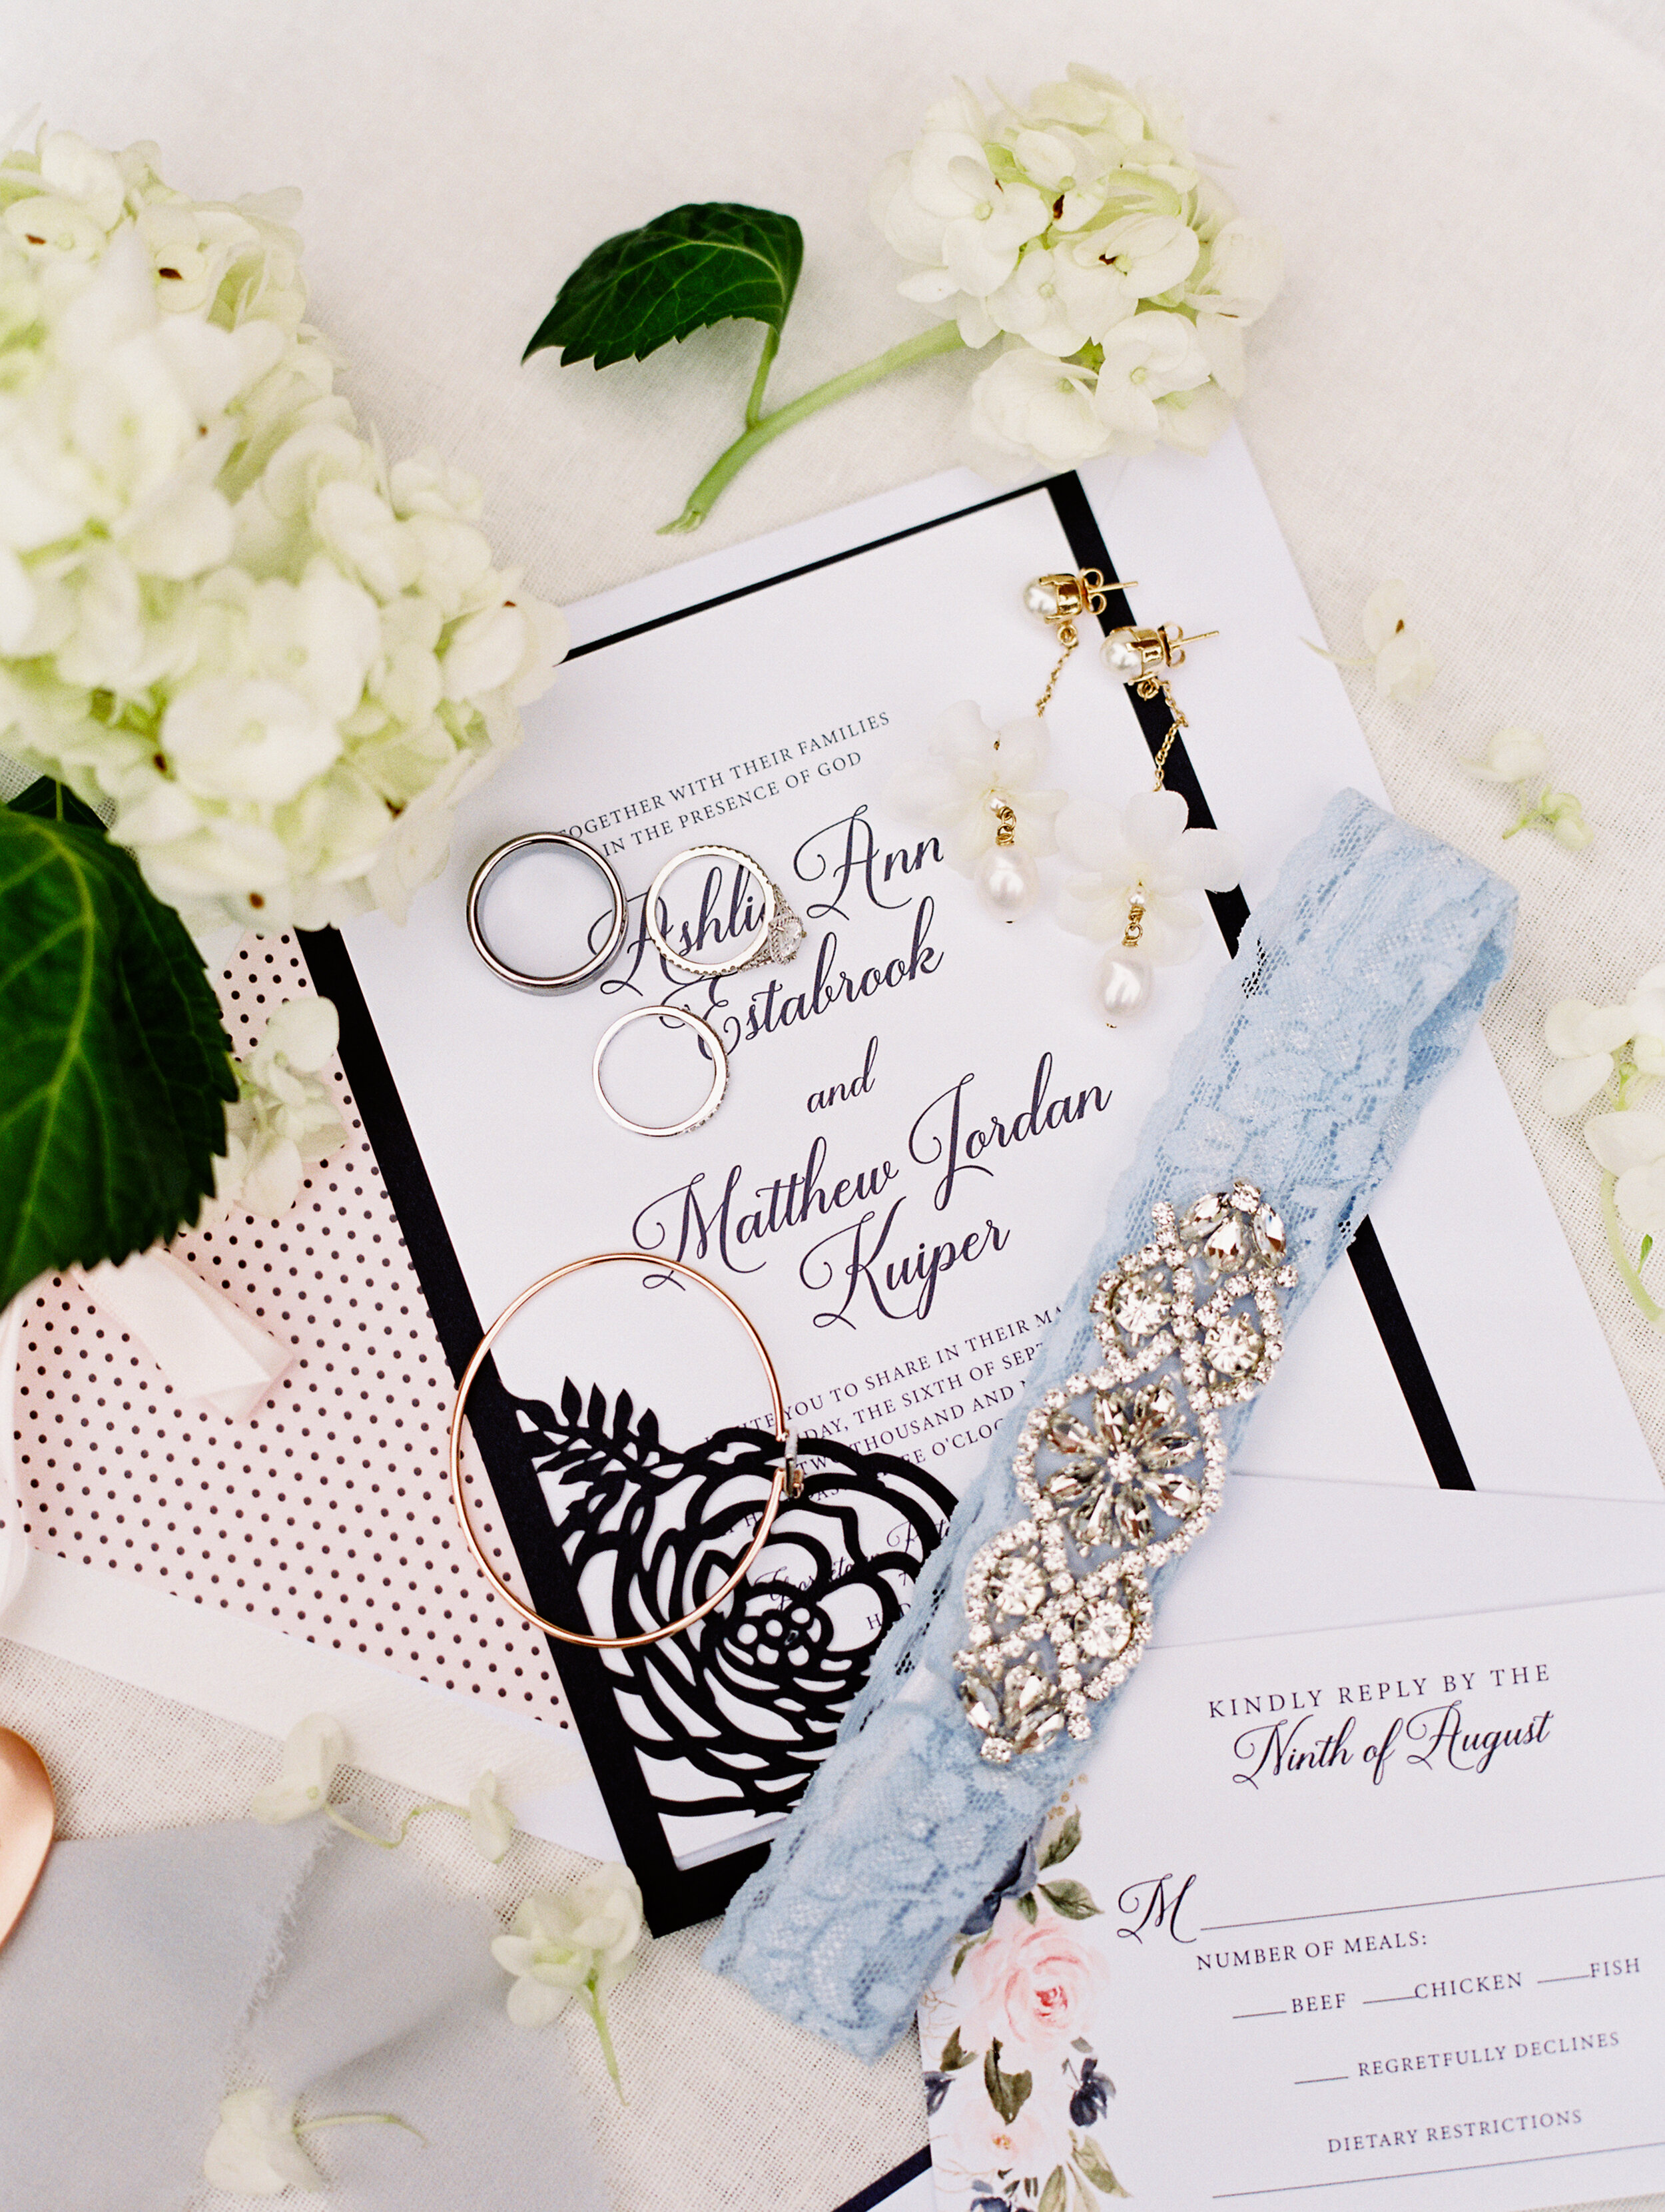 Kuiper+Wedding+Details-32.jpg